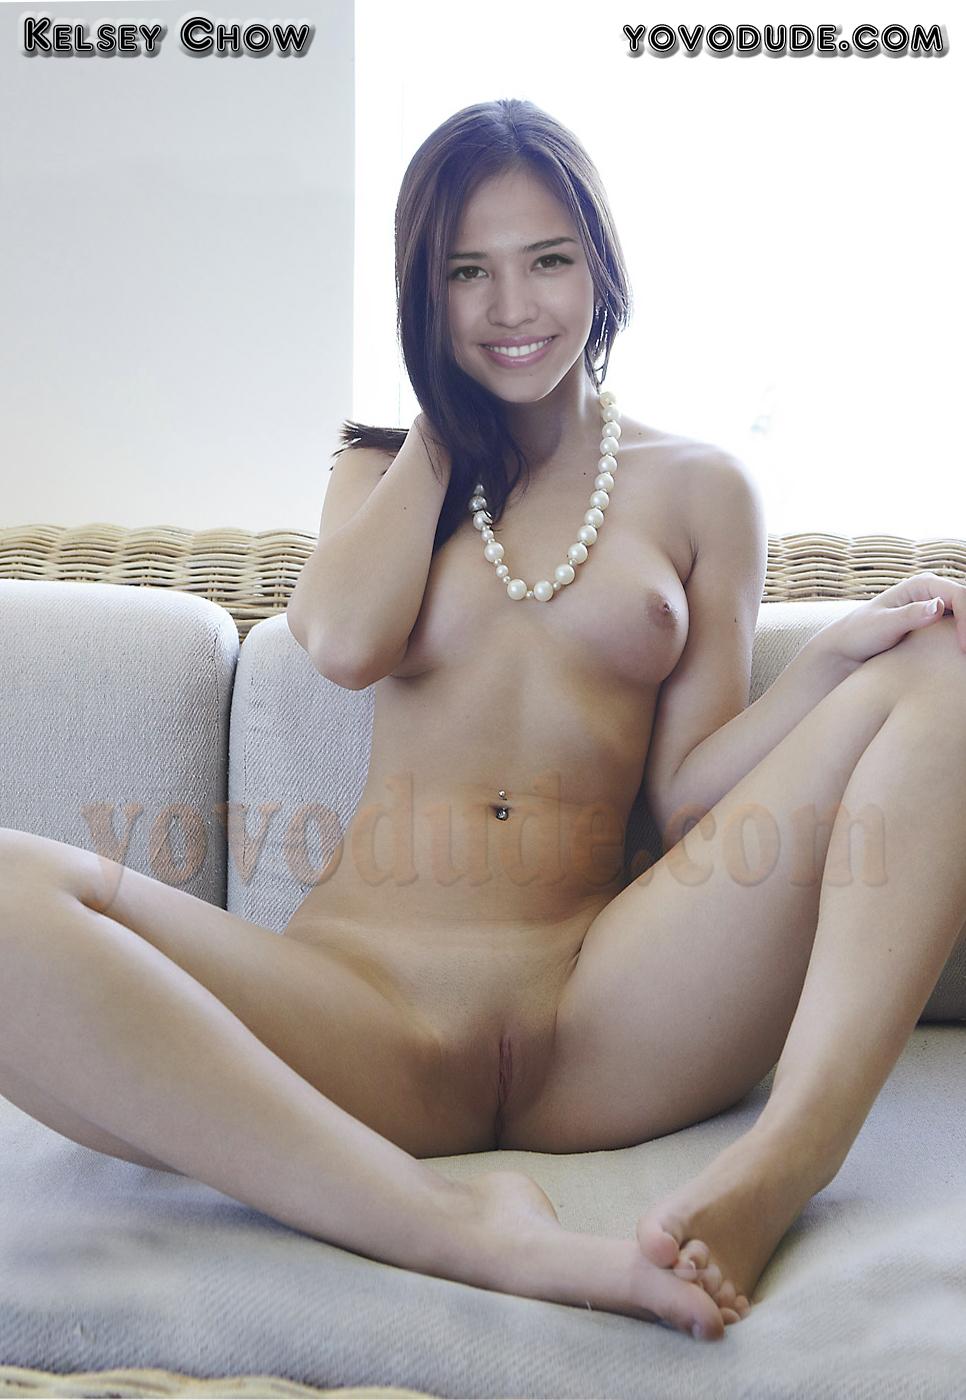 kelsey chow big boobs